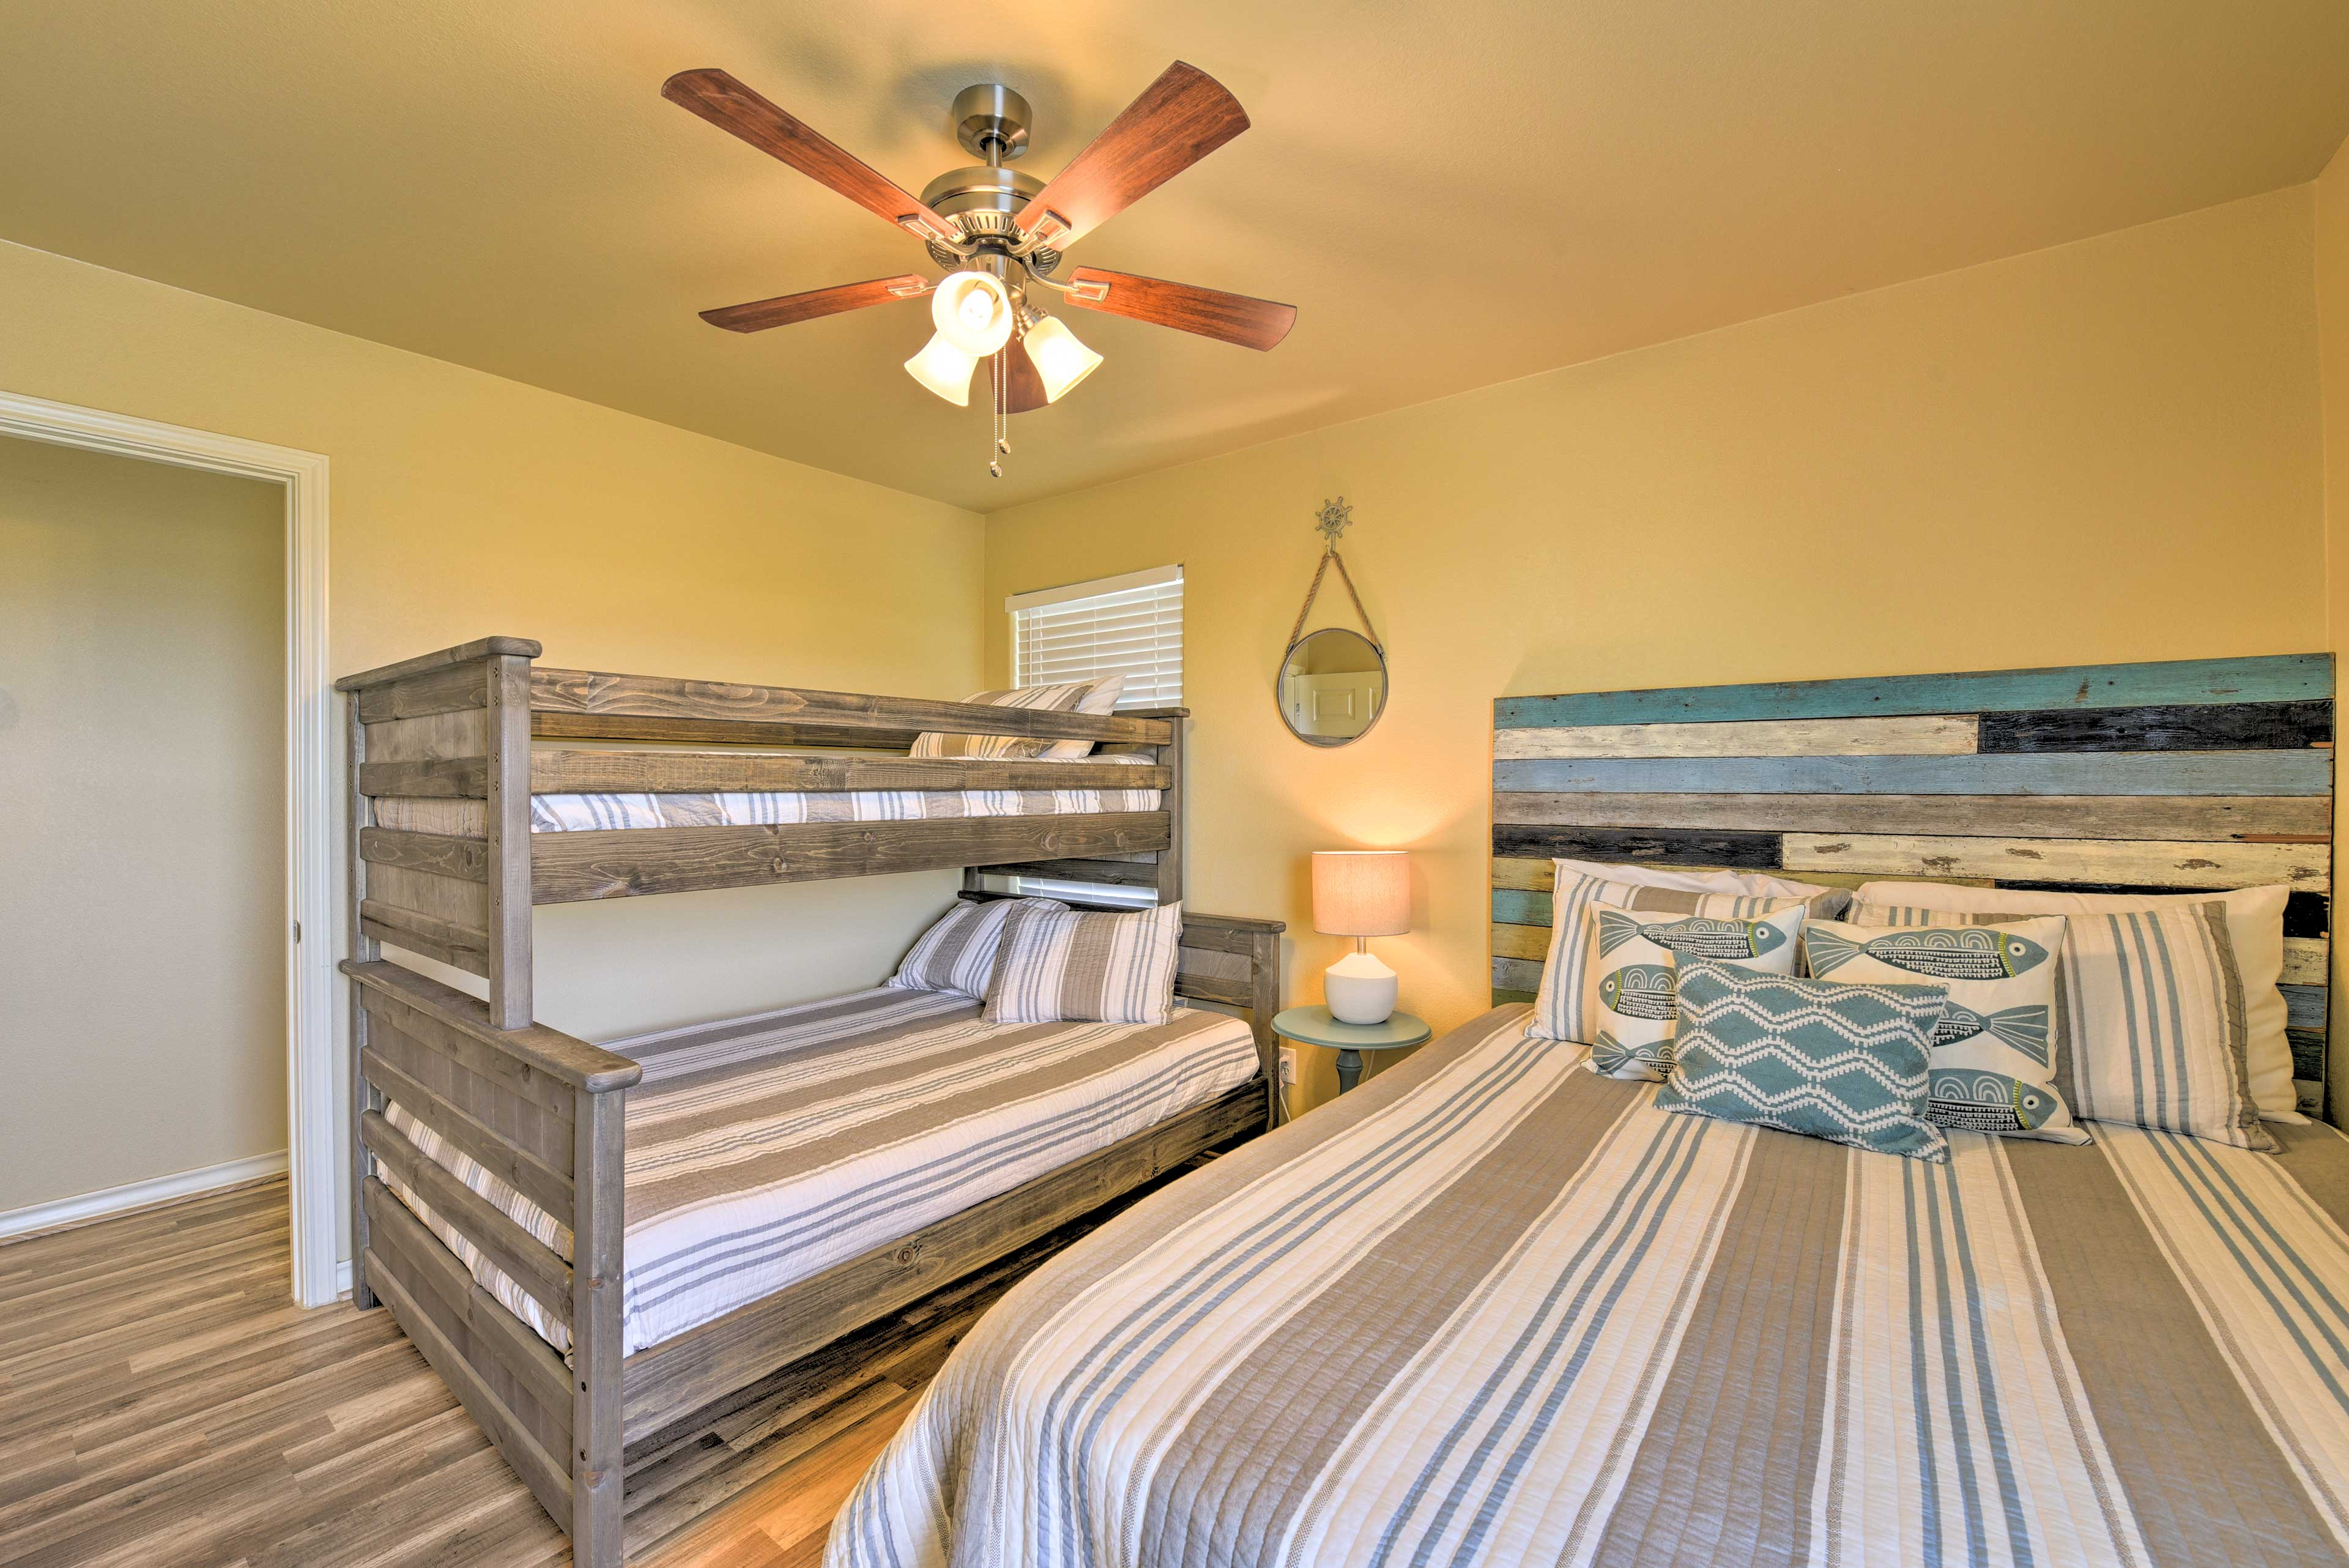 Natural light illuminates the third bedroom.